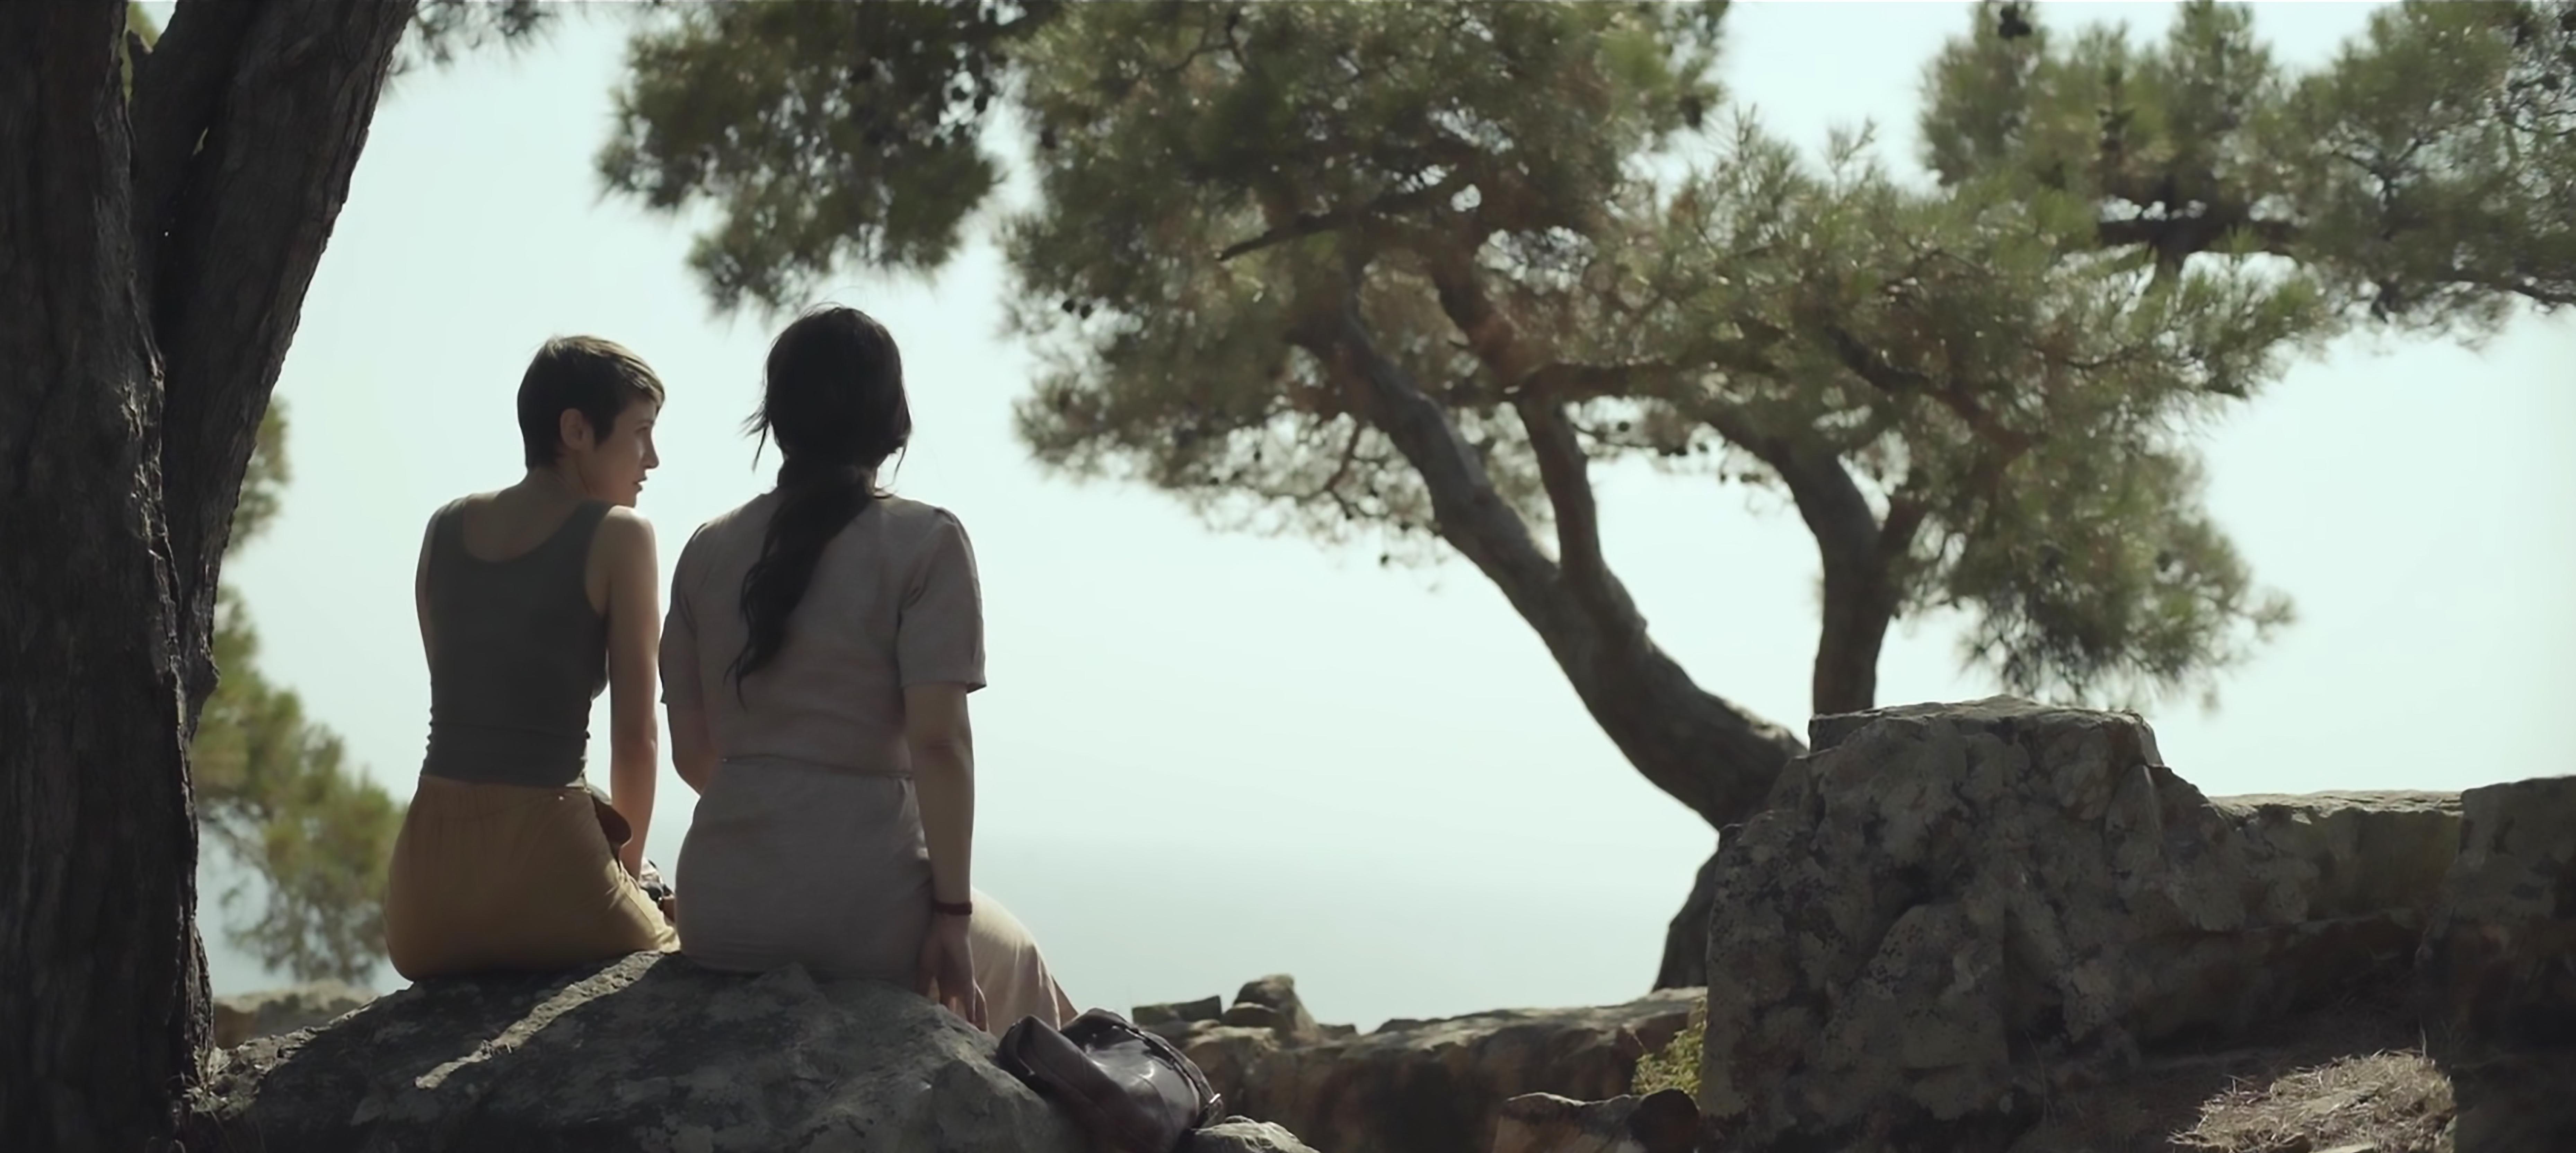 Aşk, Büyü, vs. / Love, Spells and All That